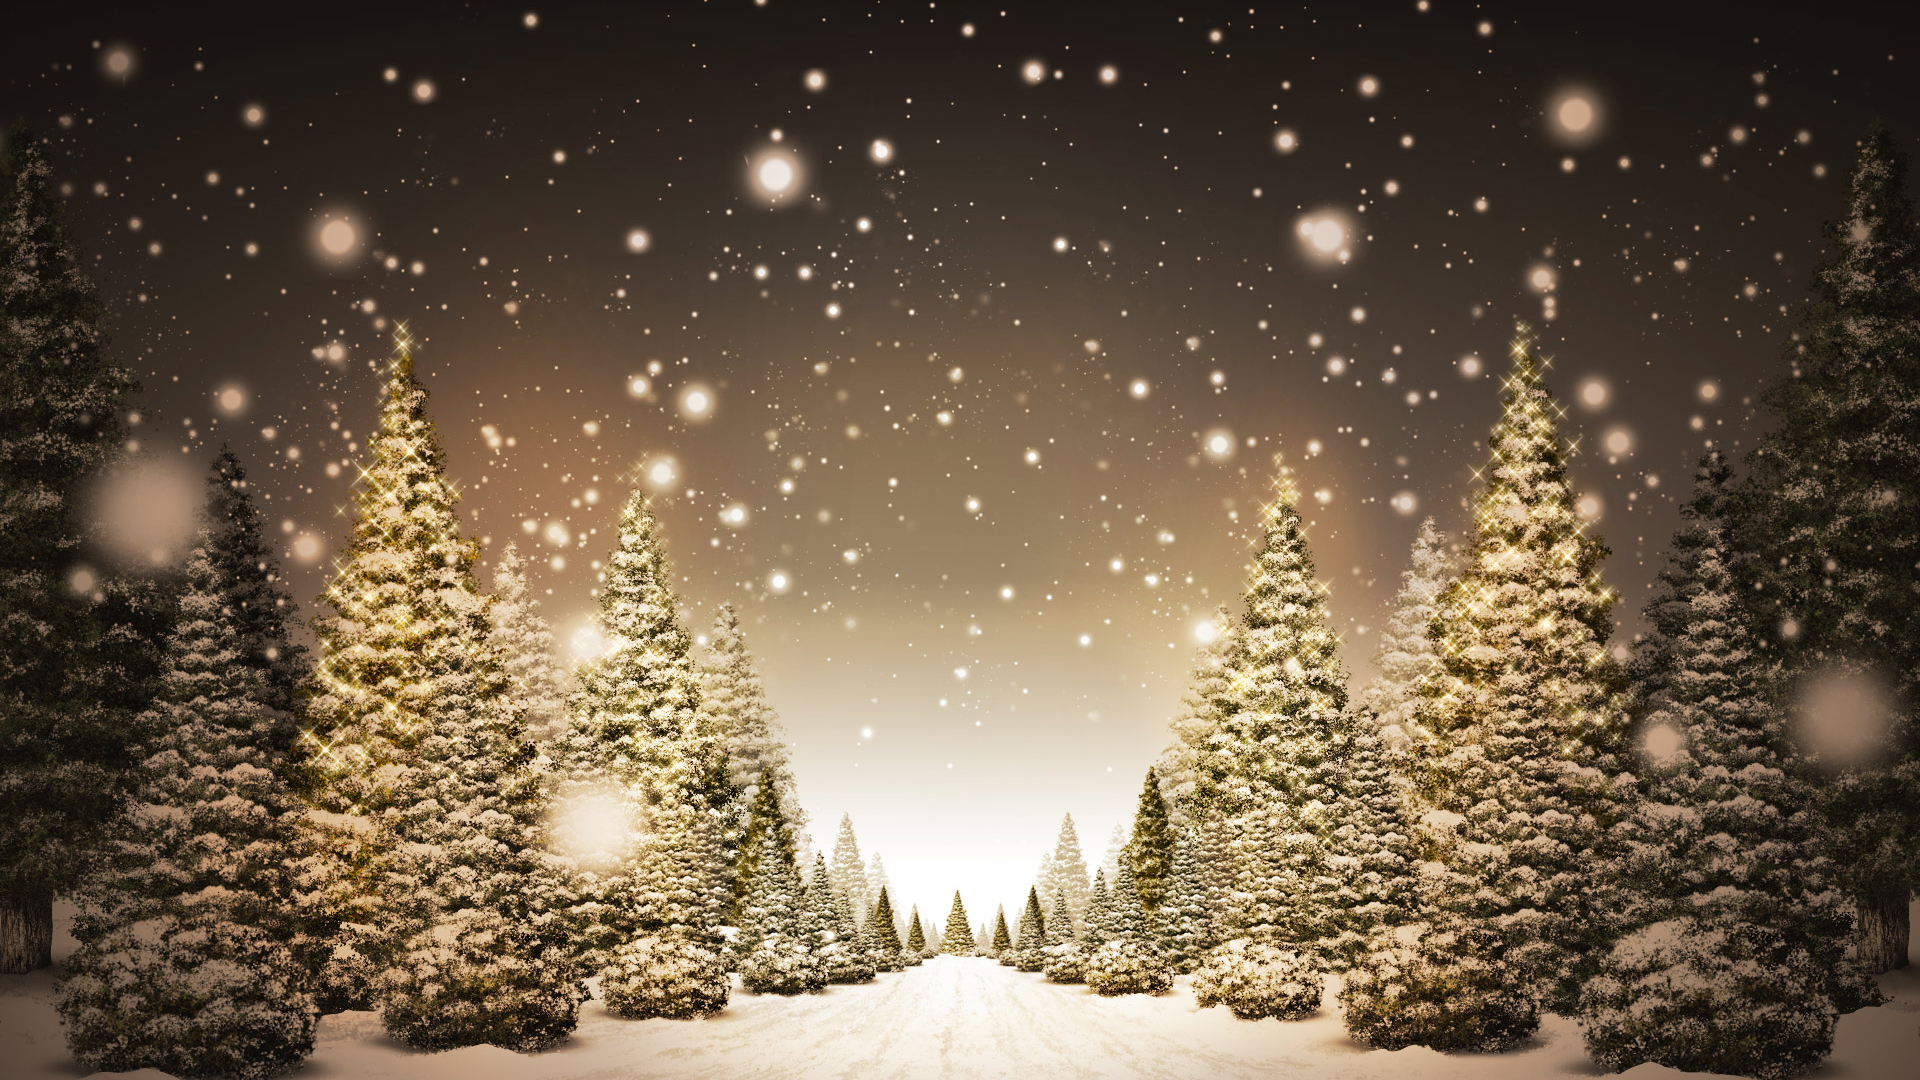 Christmas Trees in Snow HD Wallpaper FullHDWpp   Full HD Wallpapers 1920x1080